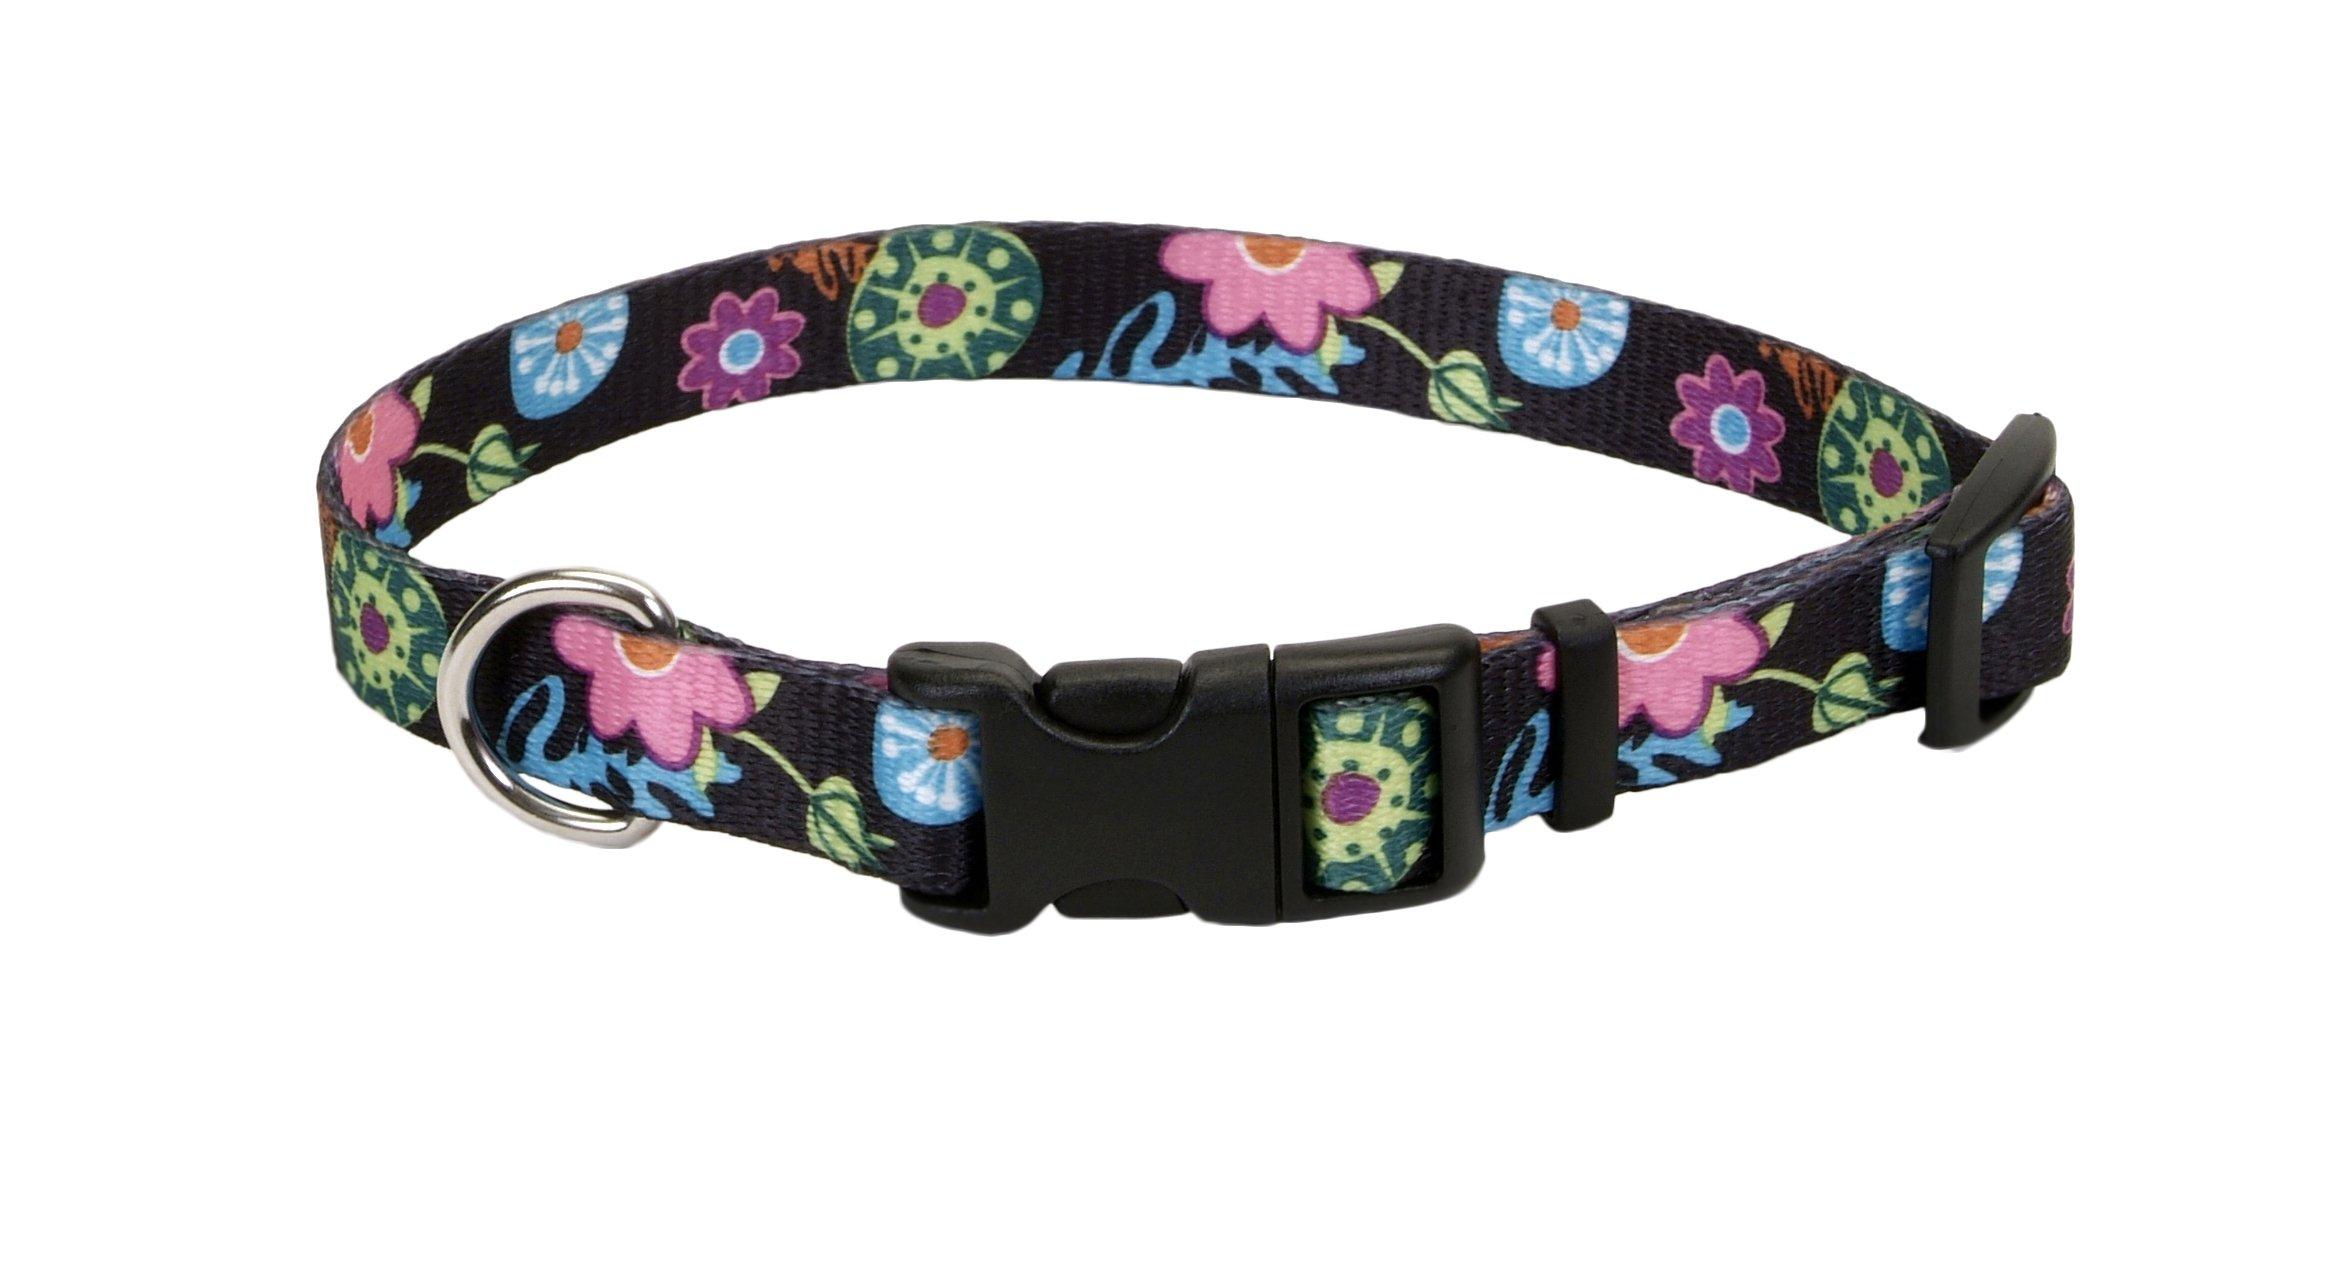 Pet Attire® Styles Adjustable Dog Collar, Wild Flower Pattern, 5/8'' x 10-14'' by Pet Attire®